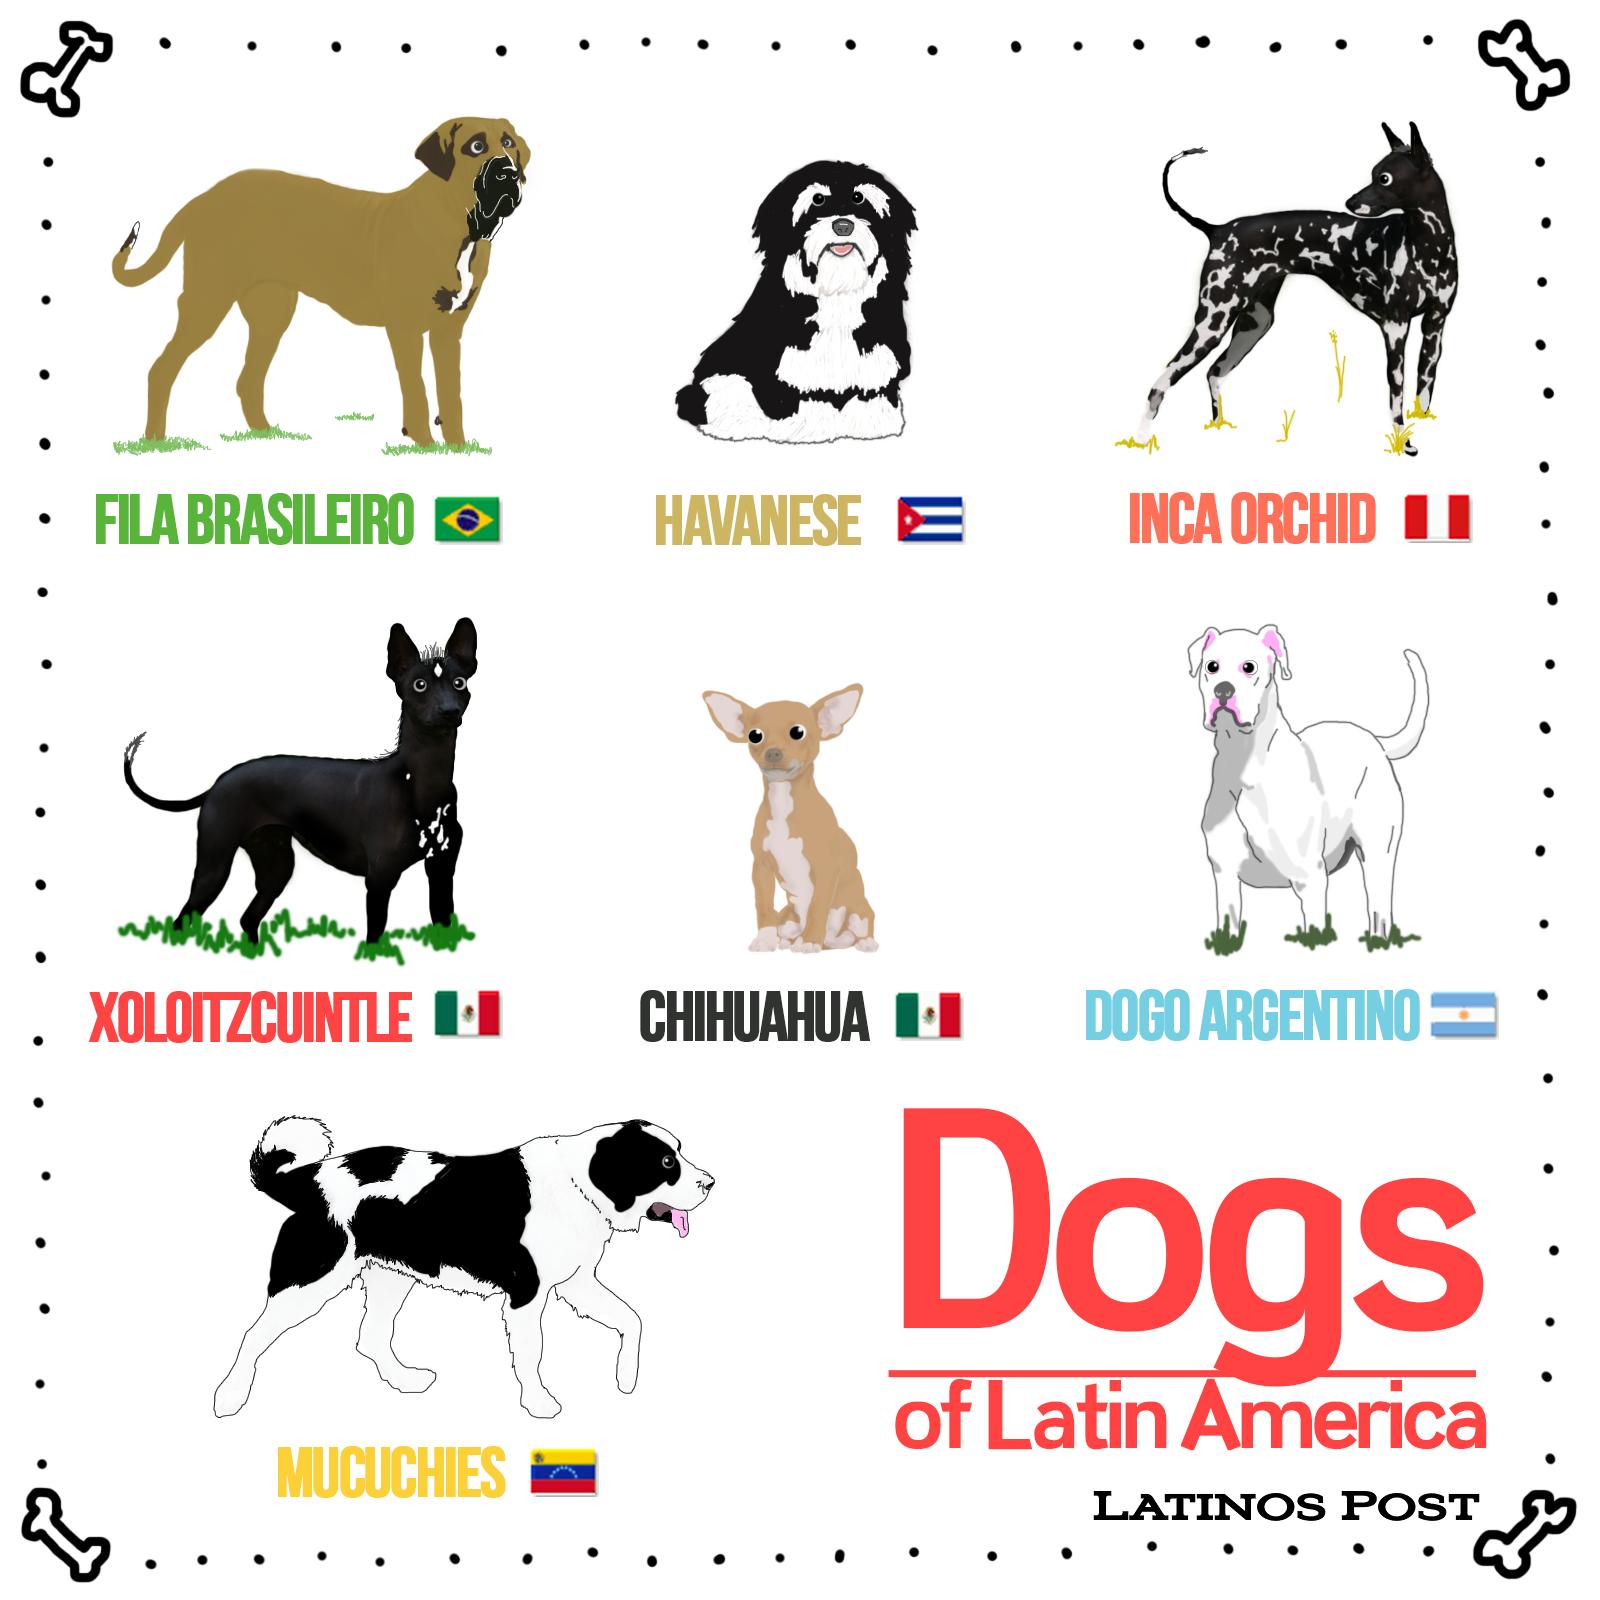 Dog Breeds of Latin America.